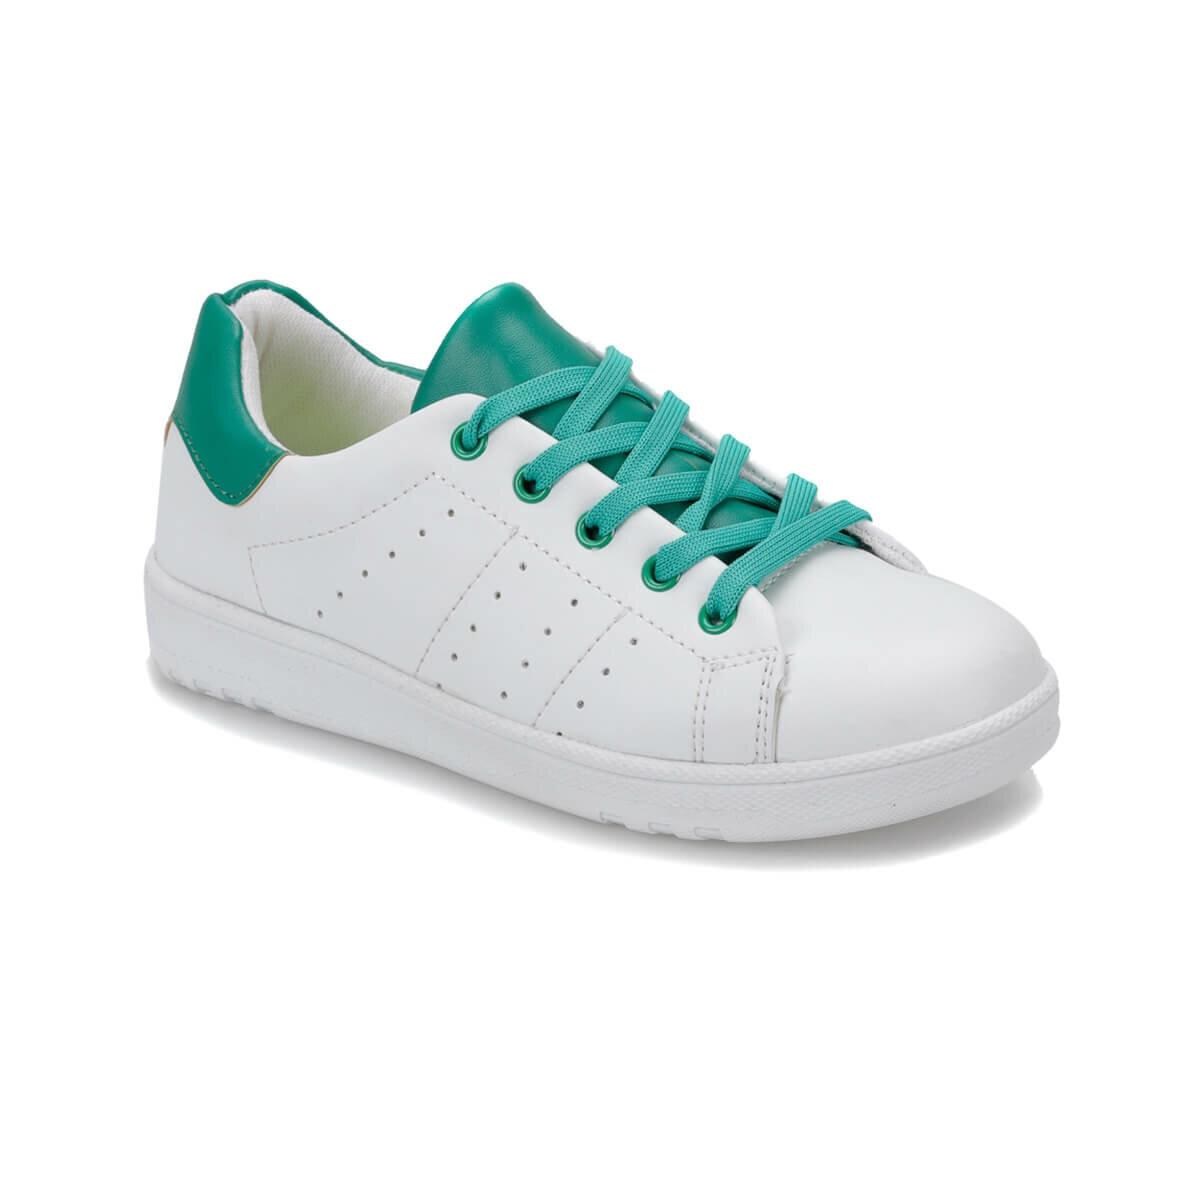 FLO SAMUEL White Male Child Sneaker Shoes I-Cool